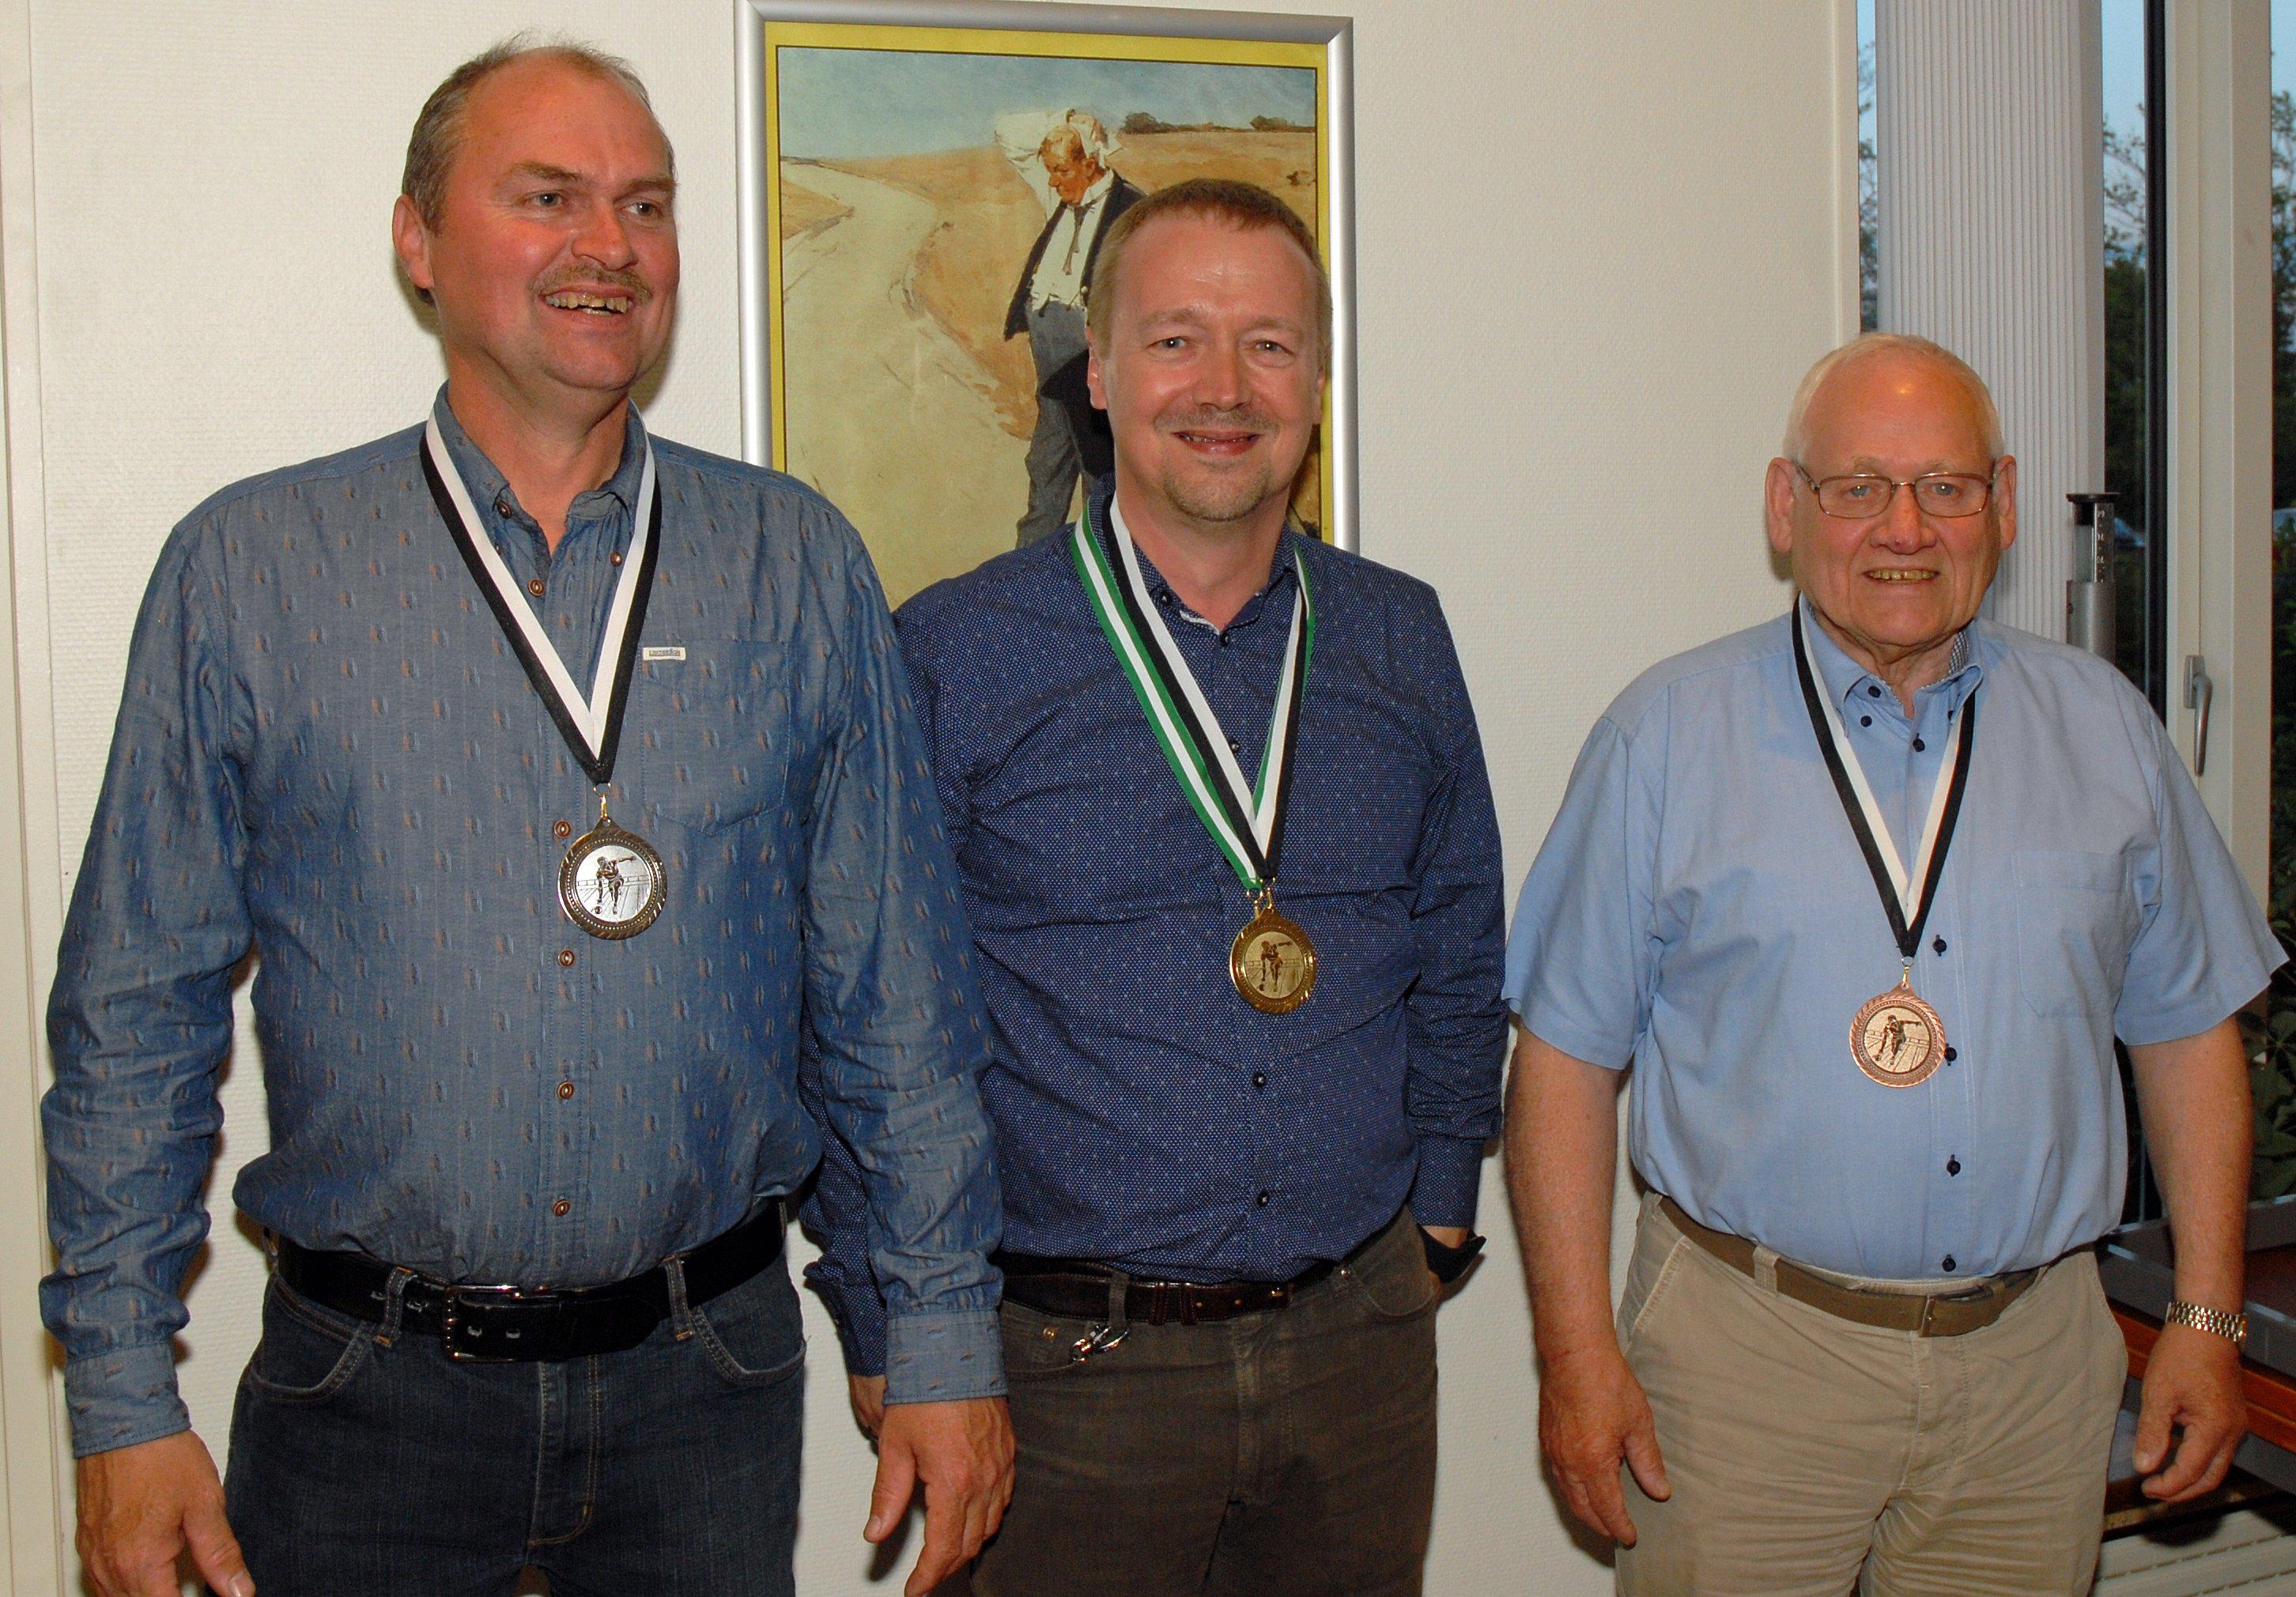 Klubmesterskab 2015. Herrer række B. Guld til Per G Sørensen, Sølv til Joe Schmidt og Bronze til Arne Christensen